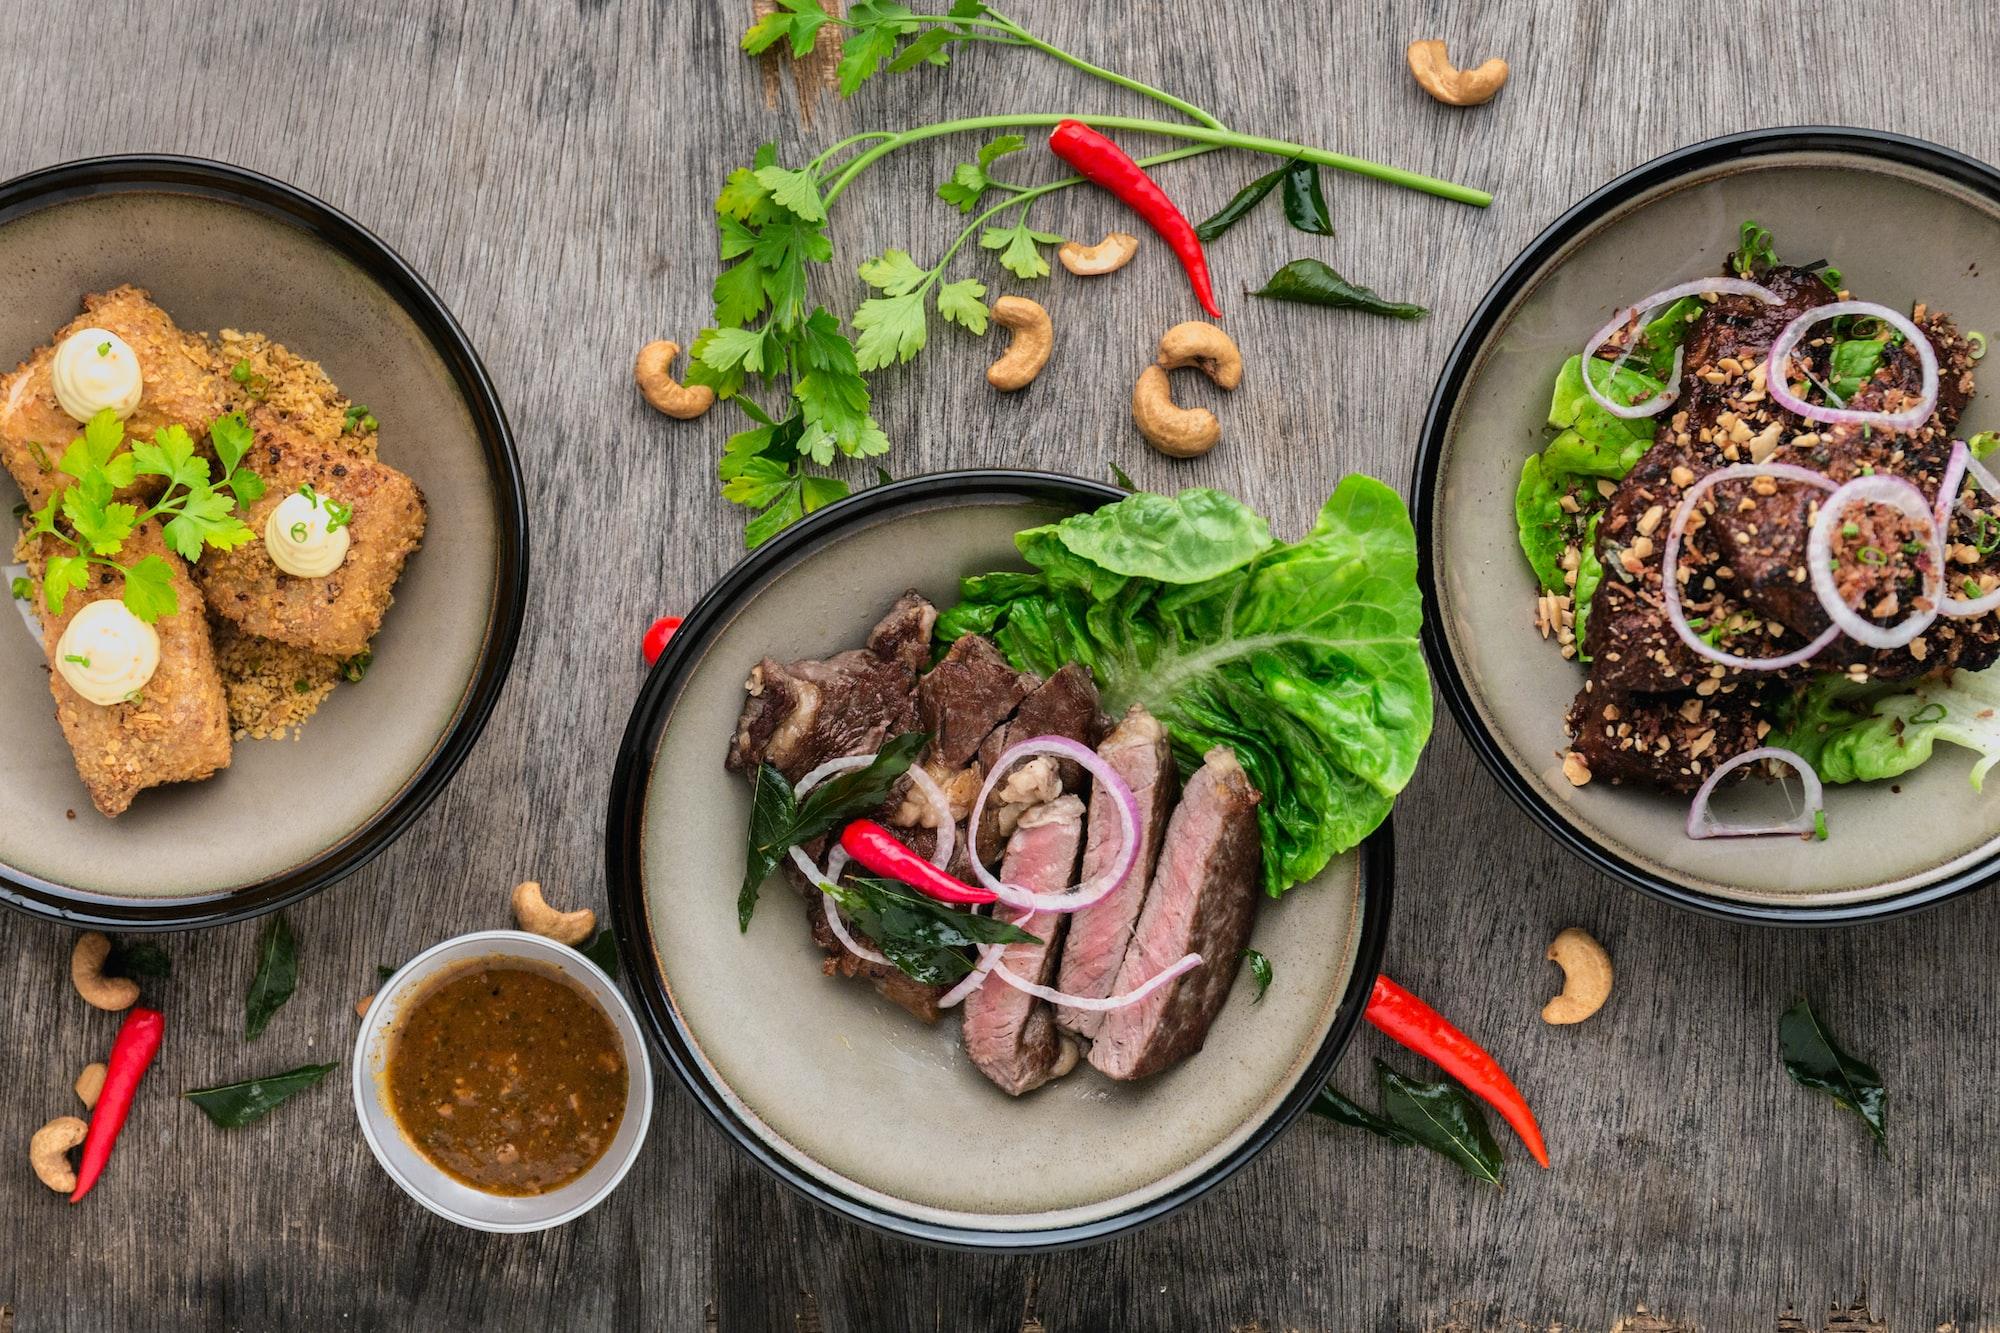 Snap My Places, Restaurateur DoorDash, SOCi Buys Brandify